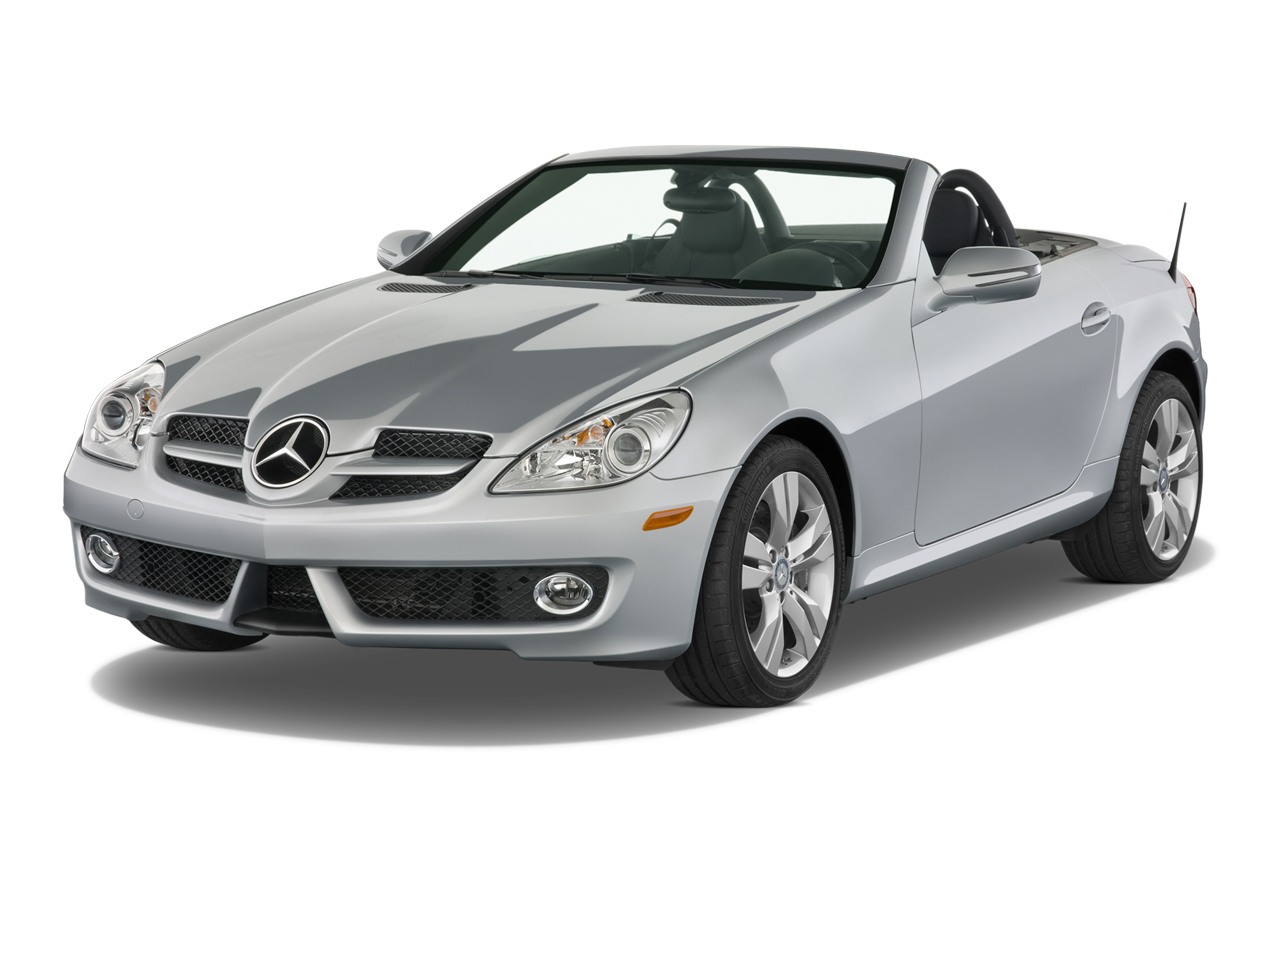 2011 mercedes benz slk class review ratings specs for Mercedes benz car ranking